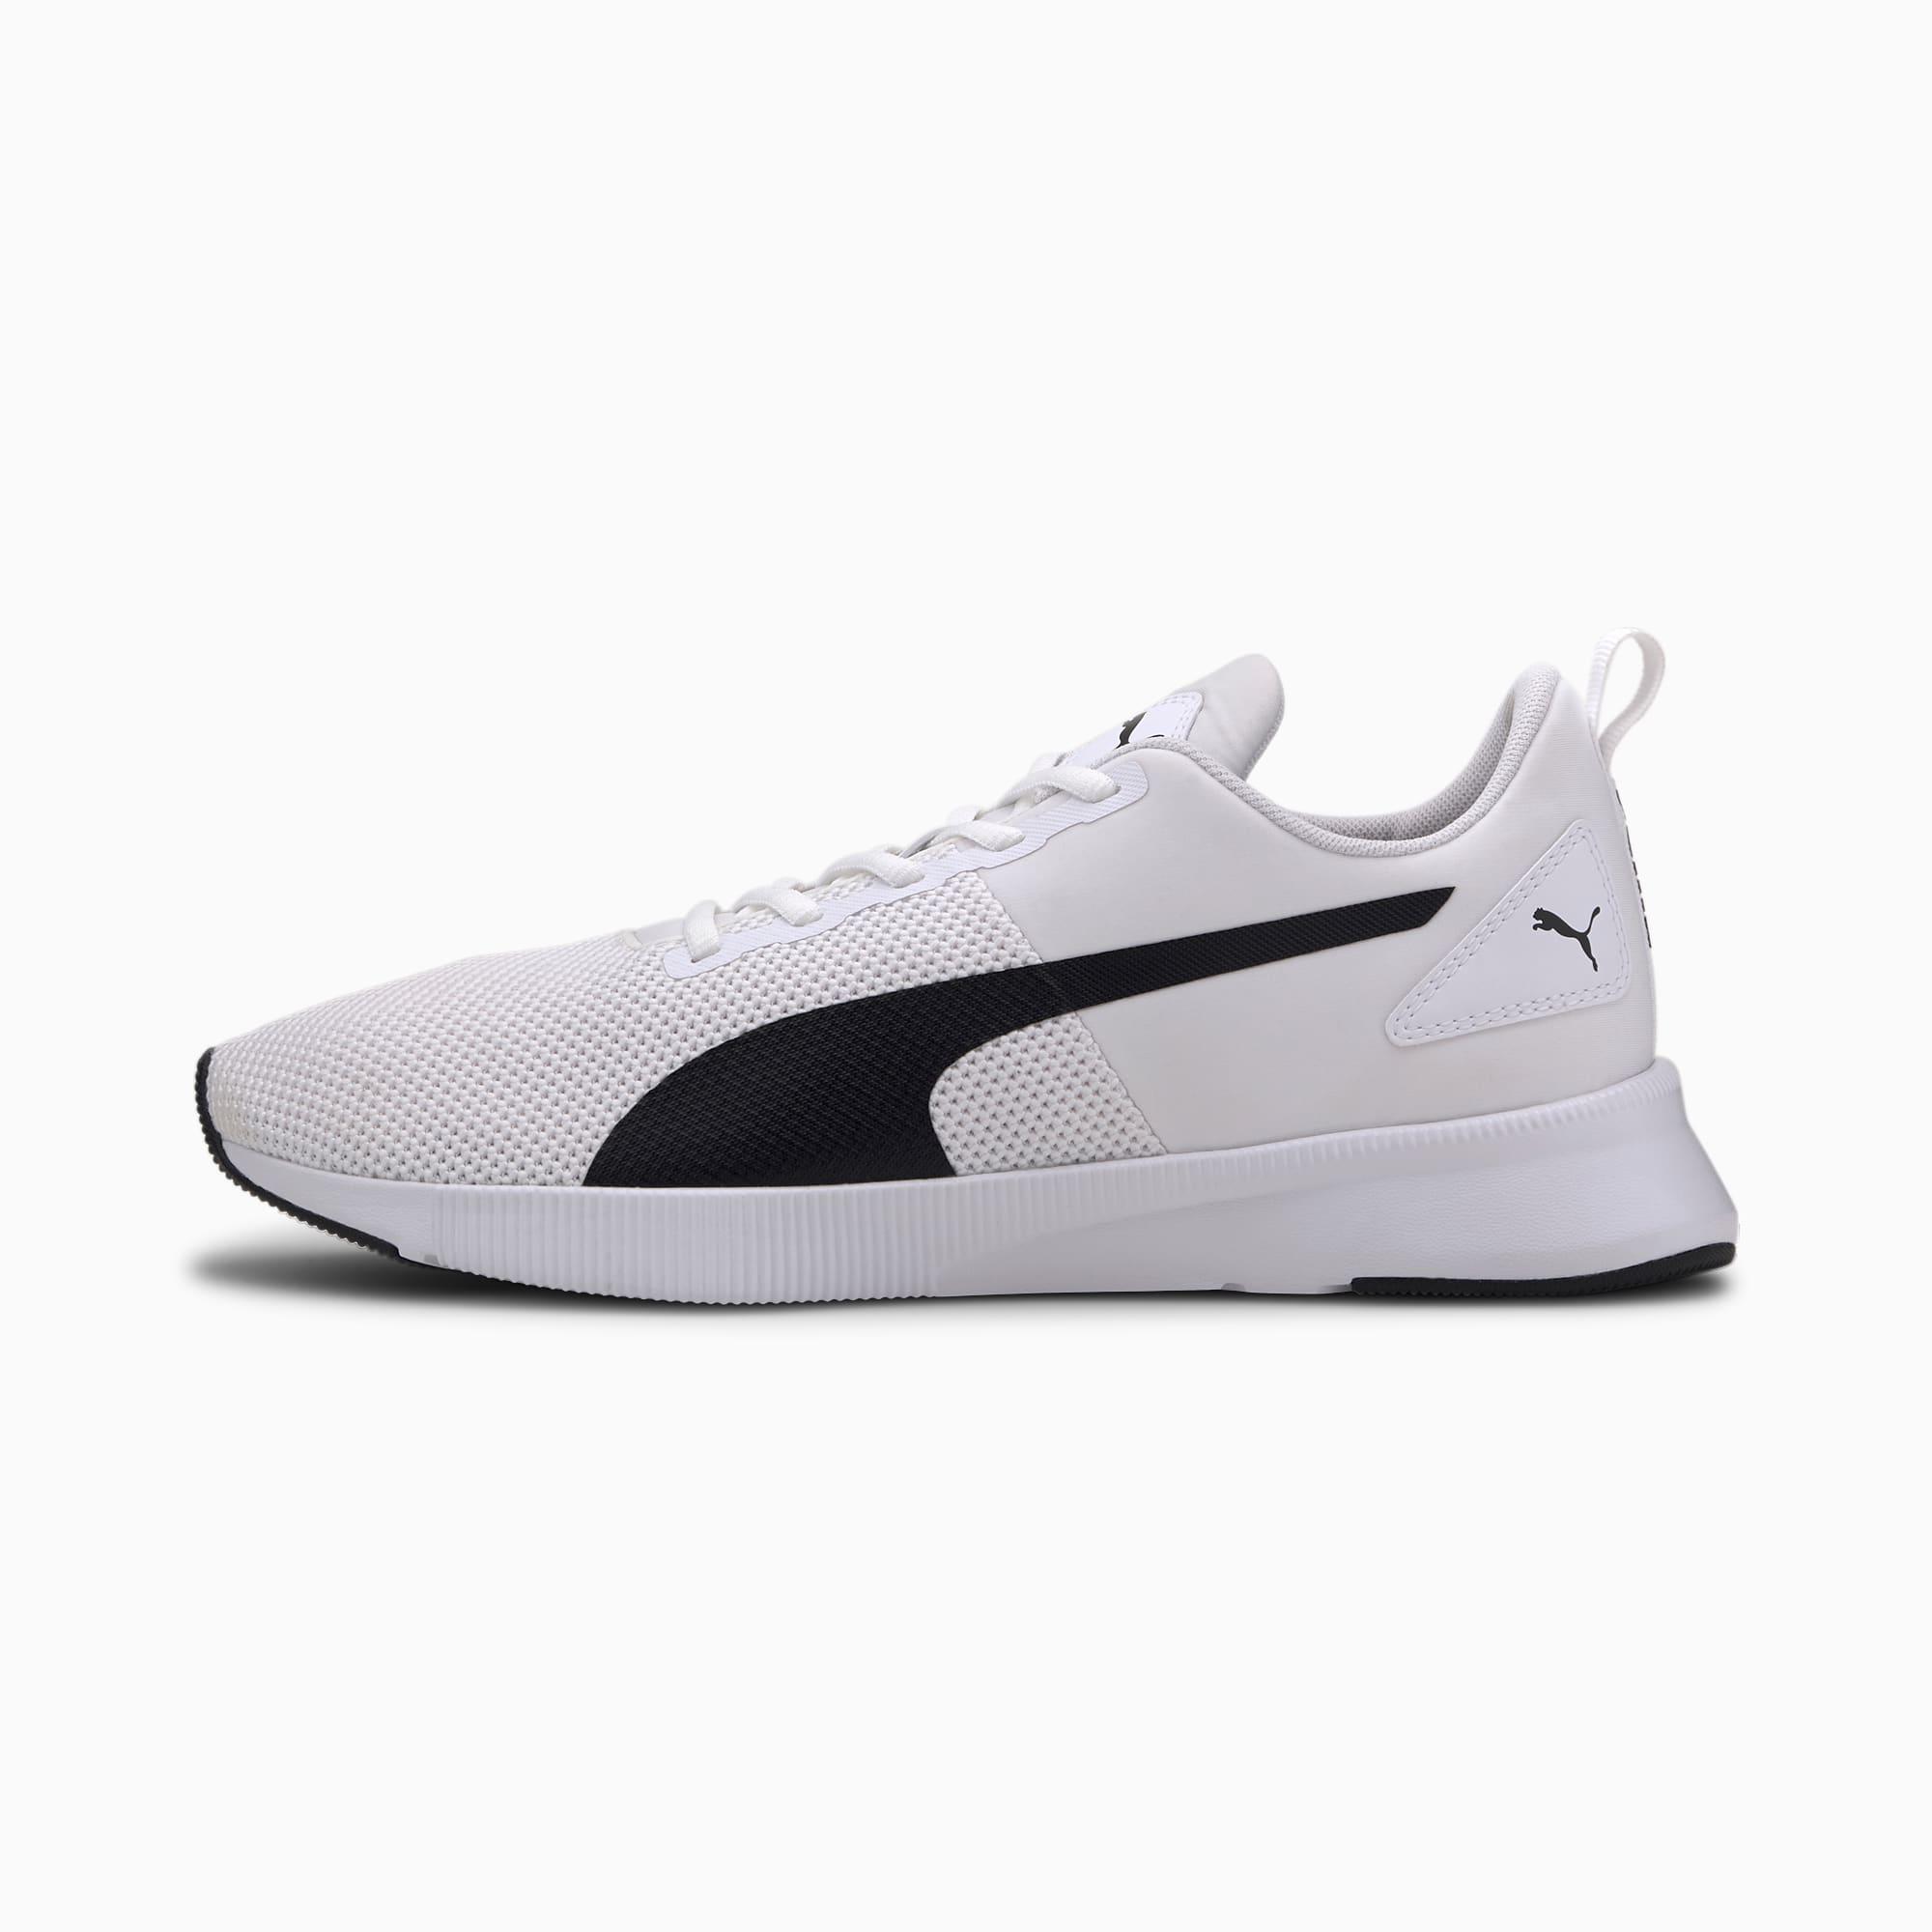 PUMA Chaussure de course Flyer Runner, Blanc/Noir, Taille 42, Chaussures